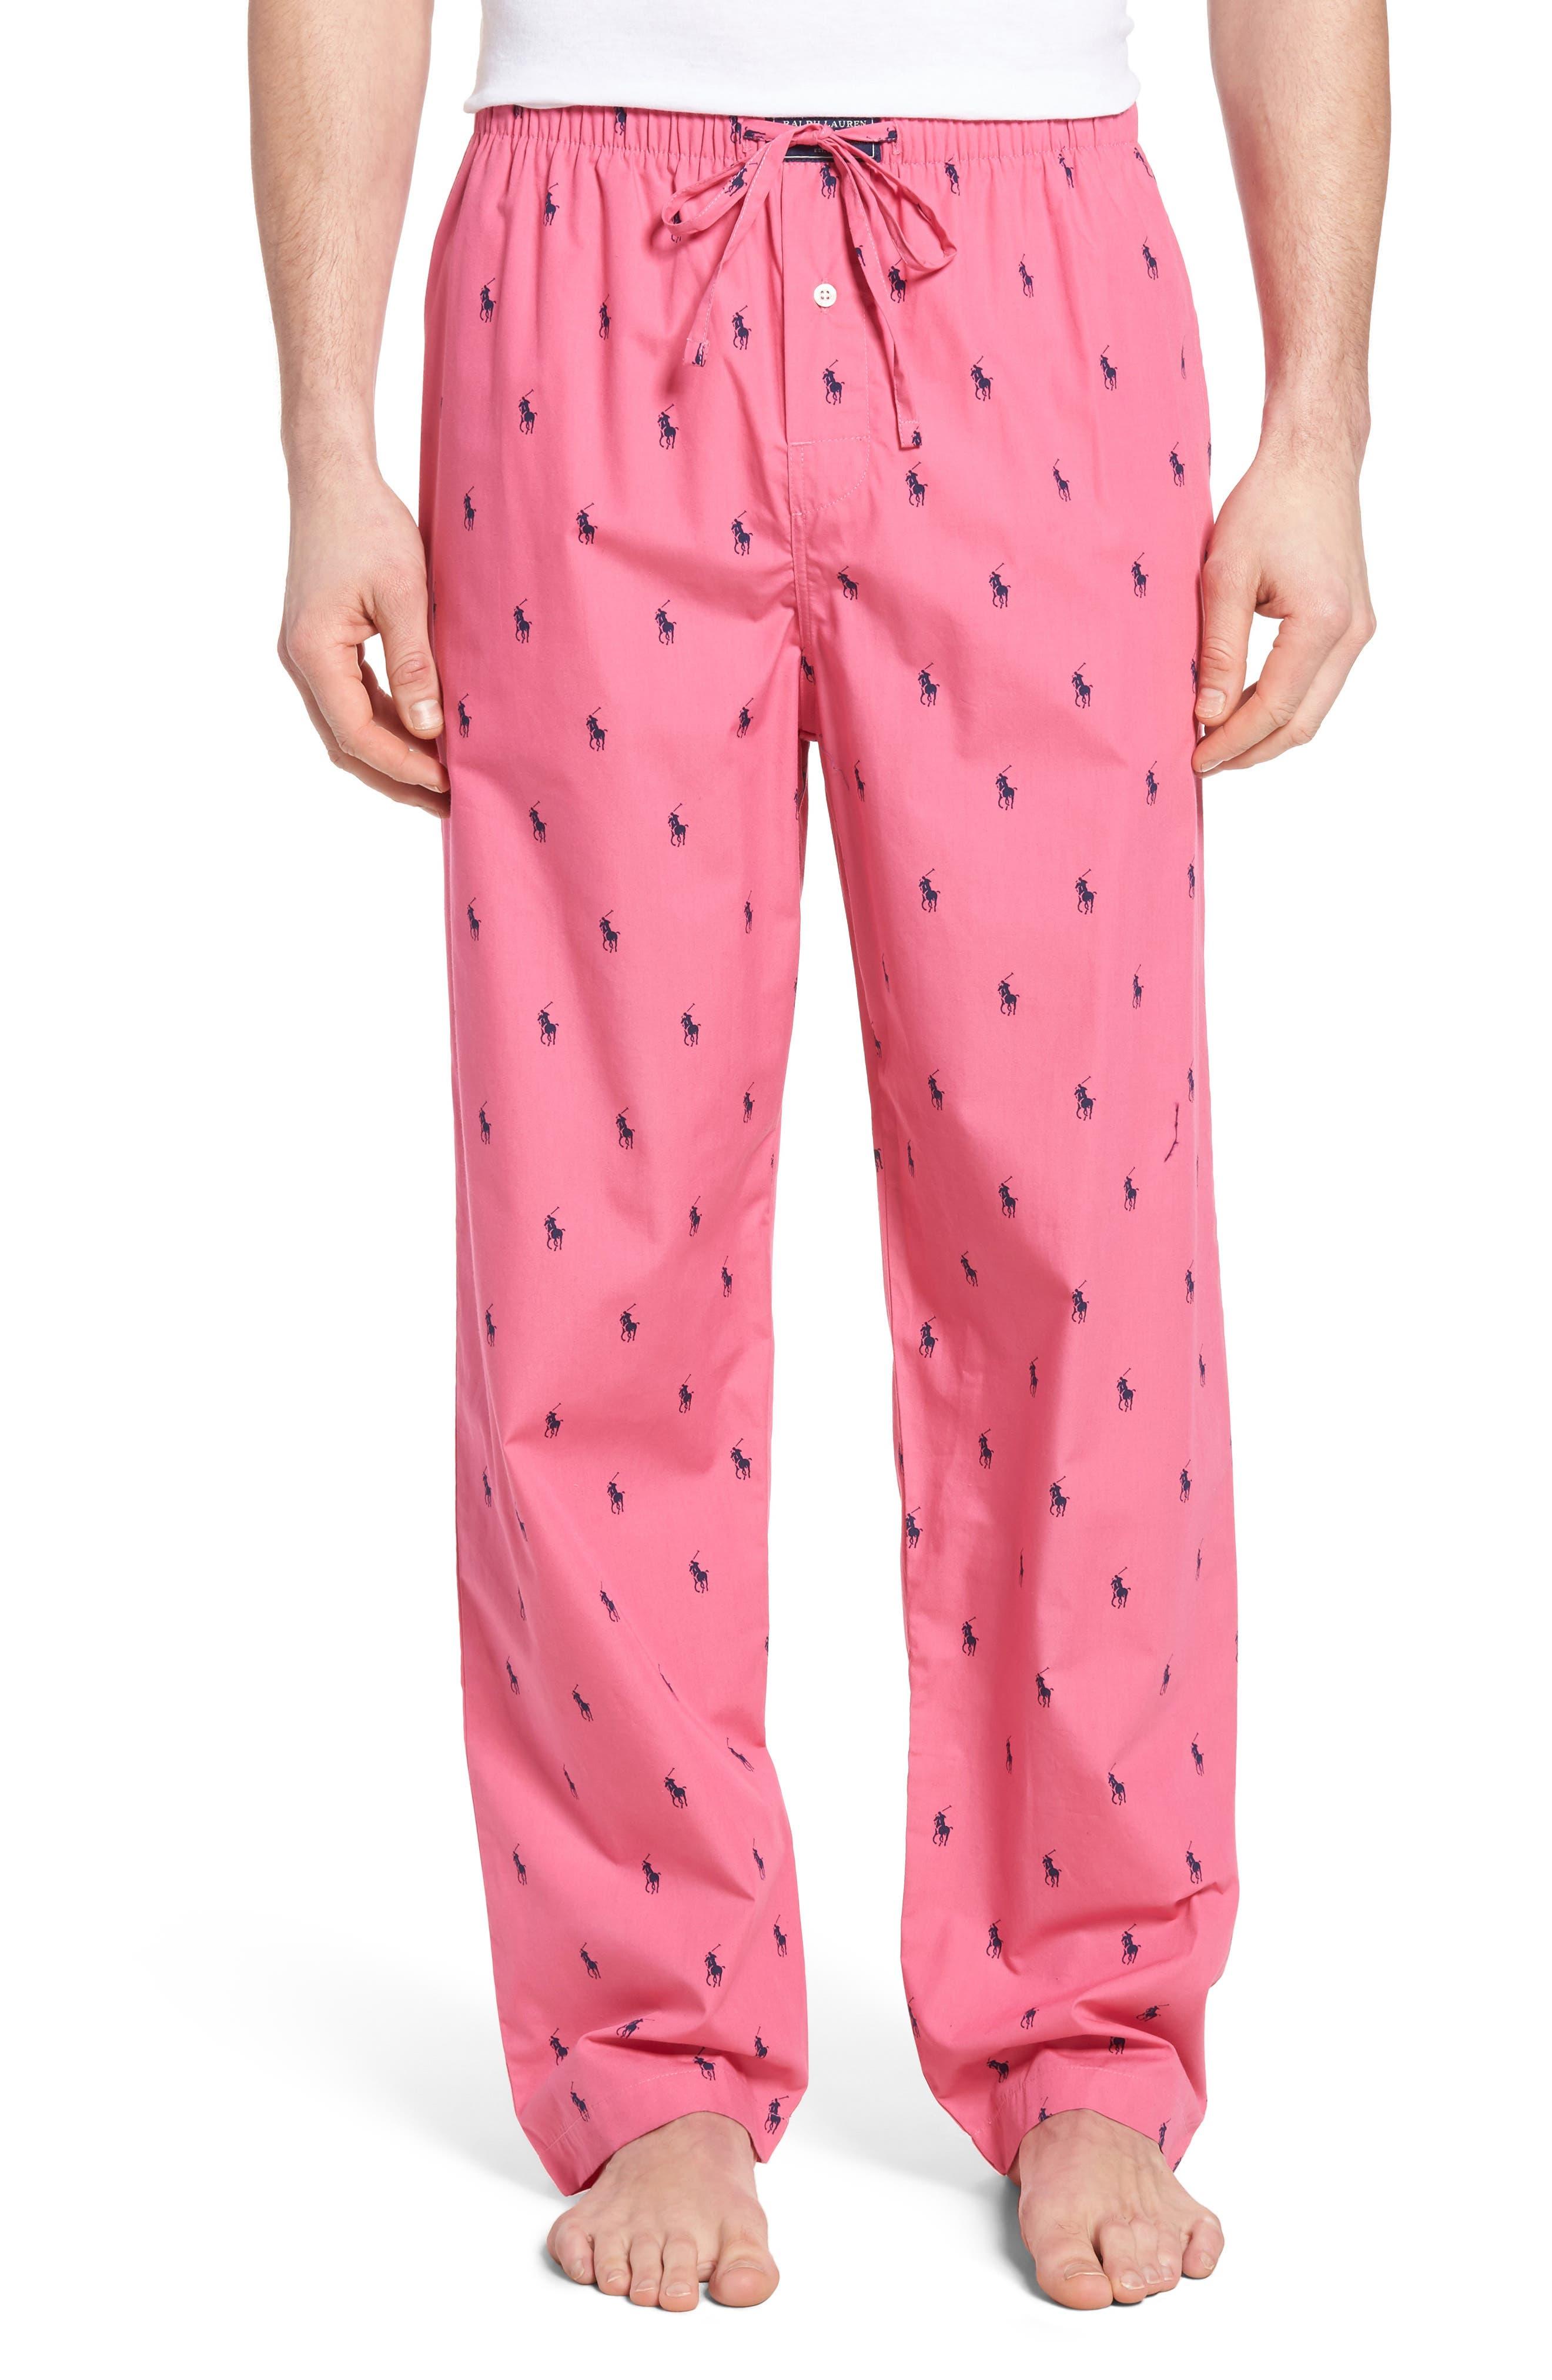 Cotton Lounge Pants,                             Main thumbnail 1, color,                             Madison Pink